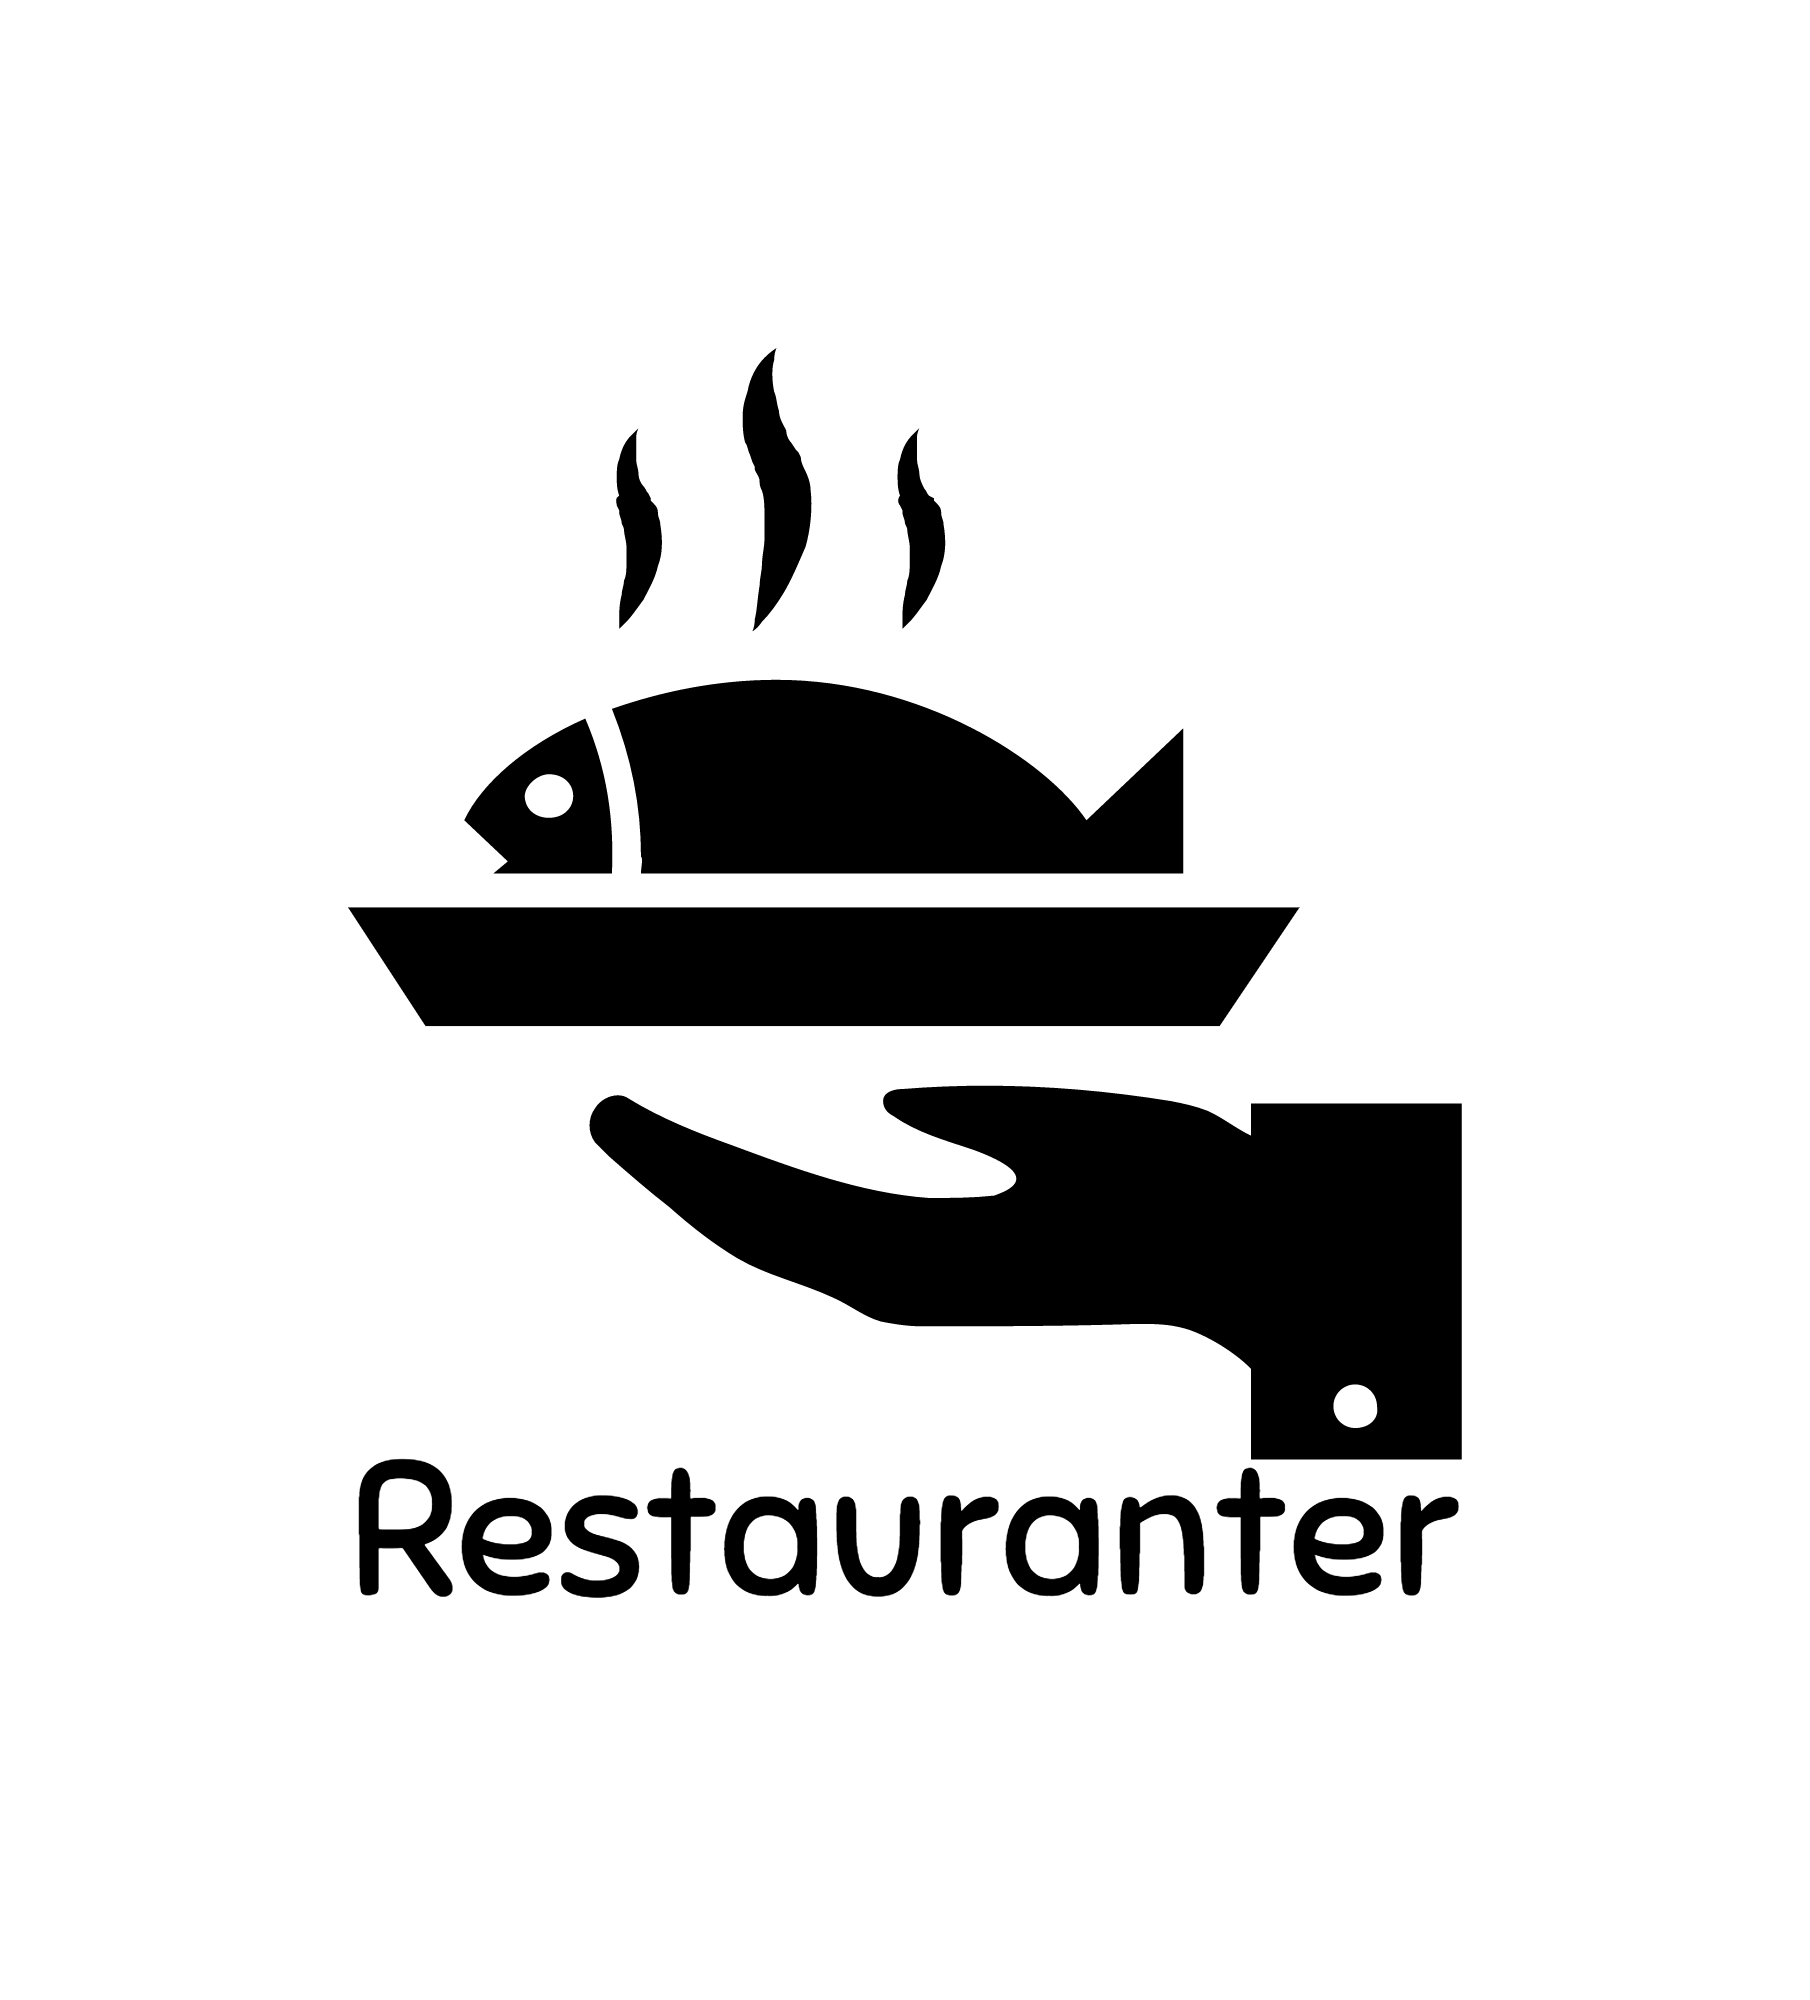 Restauranter-logo-black.png